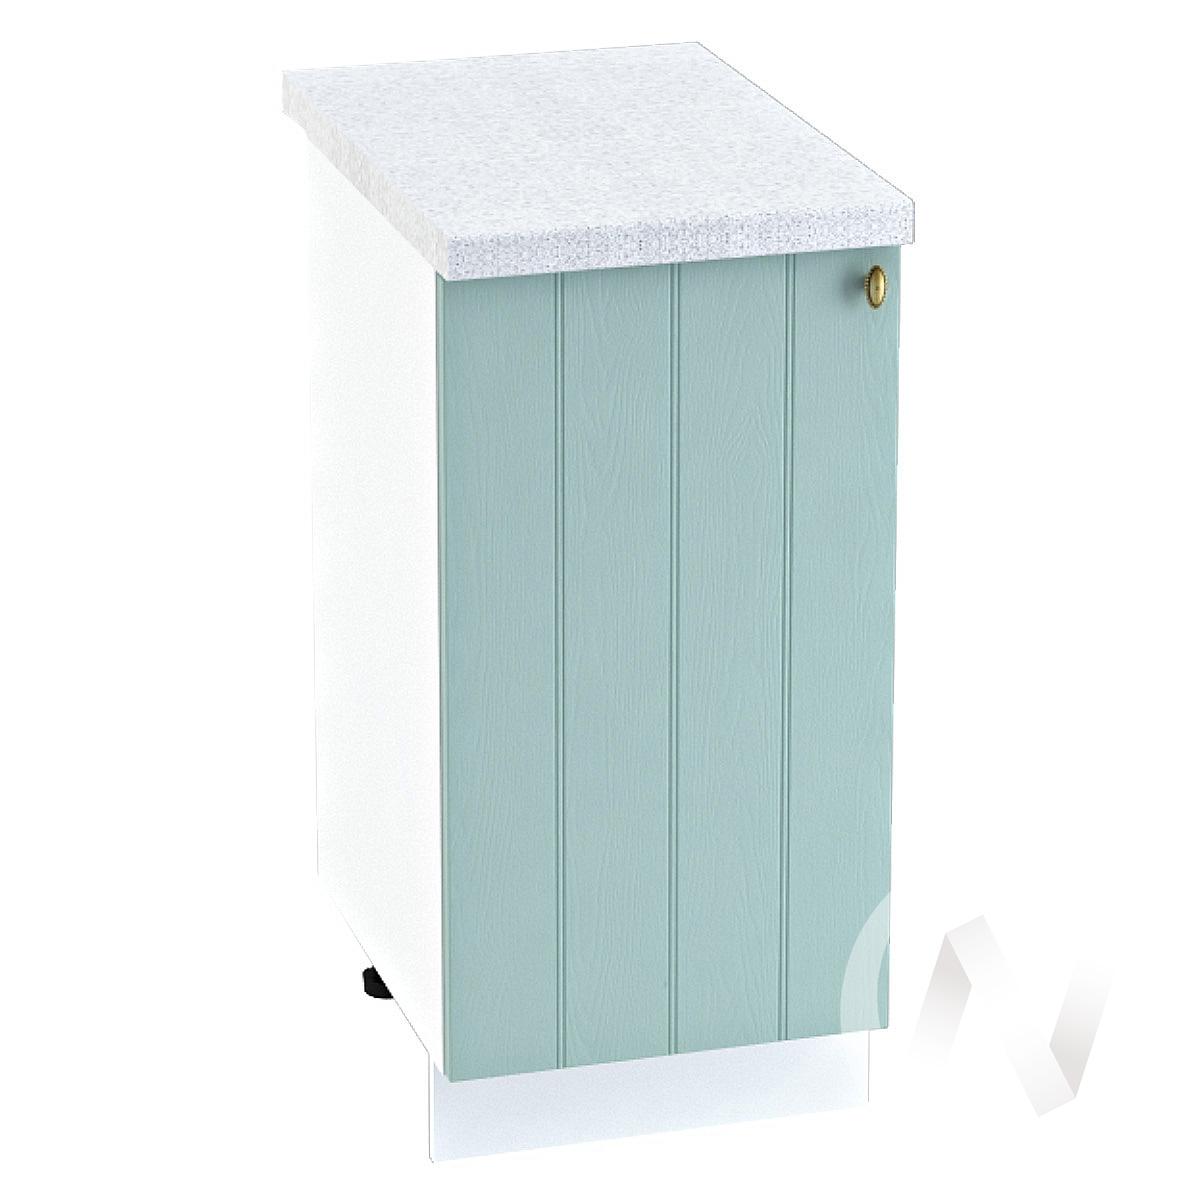 "Кухня ""Прованс"": Шкаф нижний 400, ШН 400 (голубой/корпус белый)"